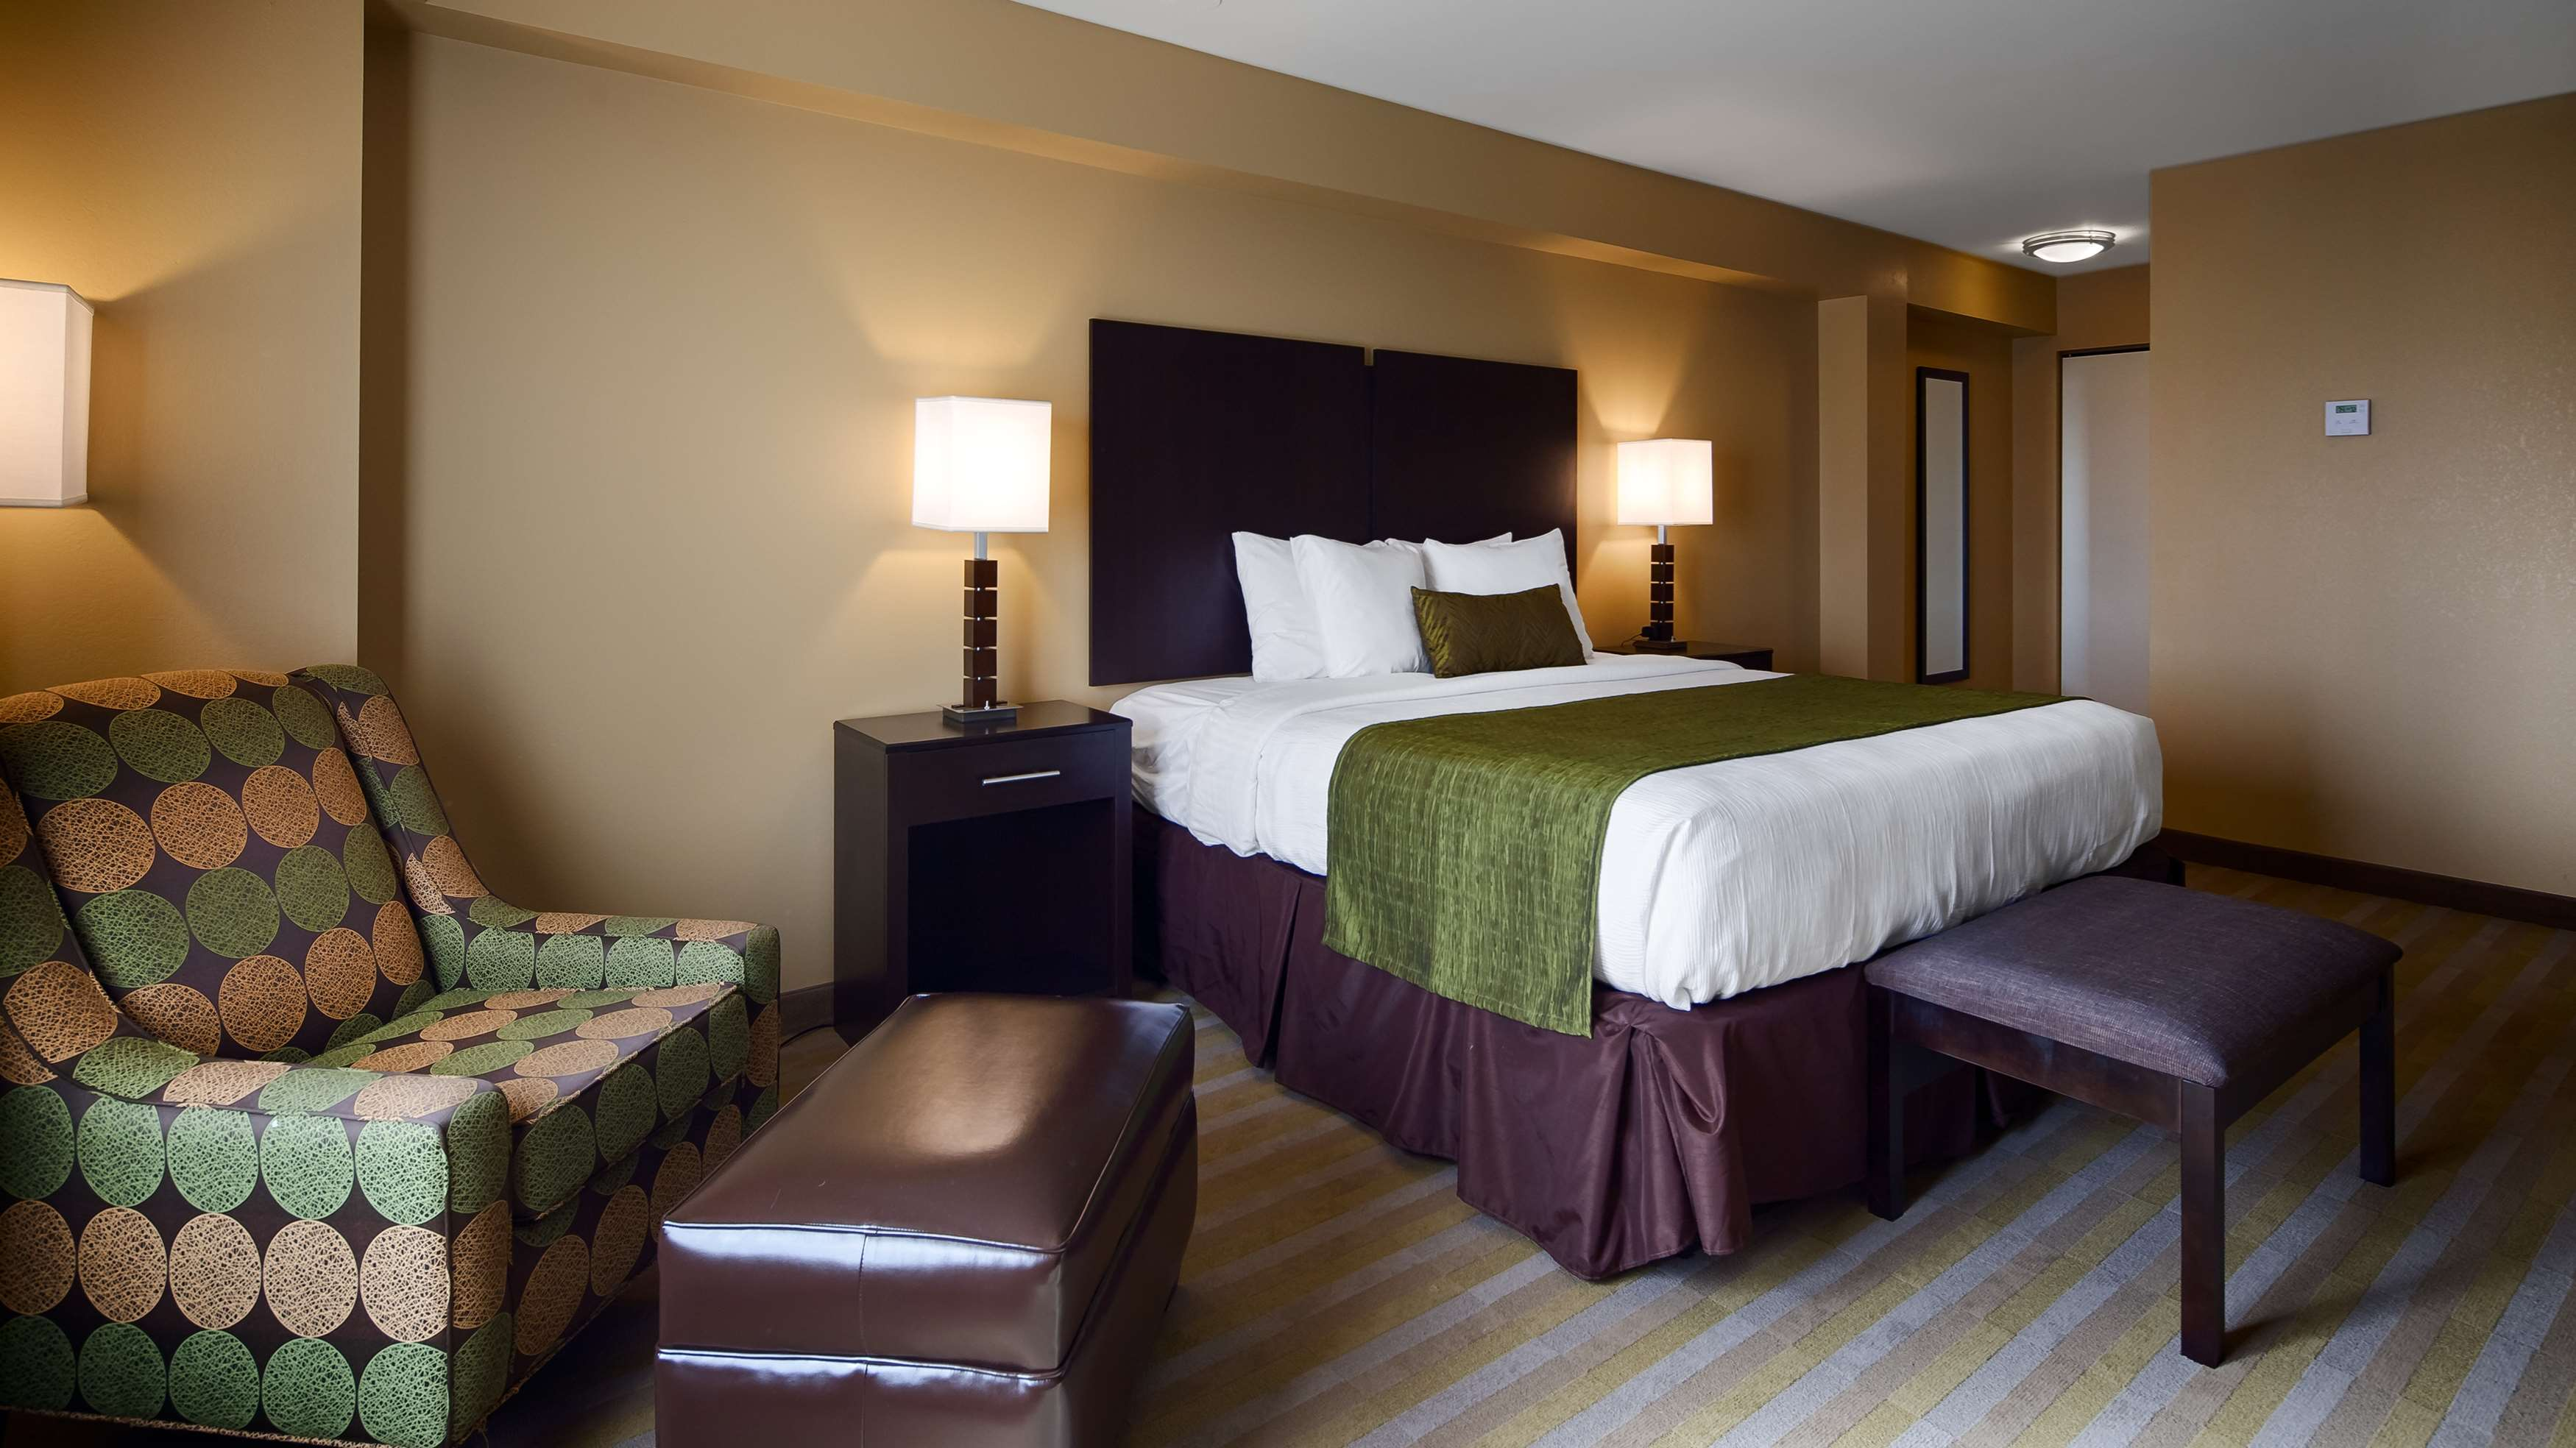 Best Western Plus Thornburg Inn & Suites image 19